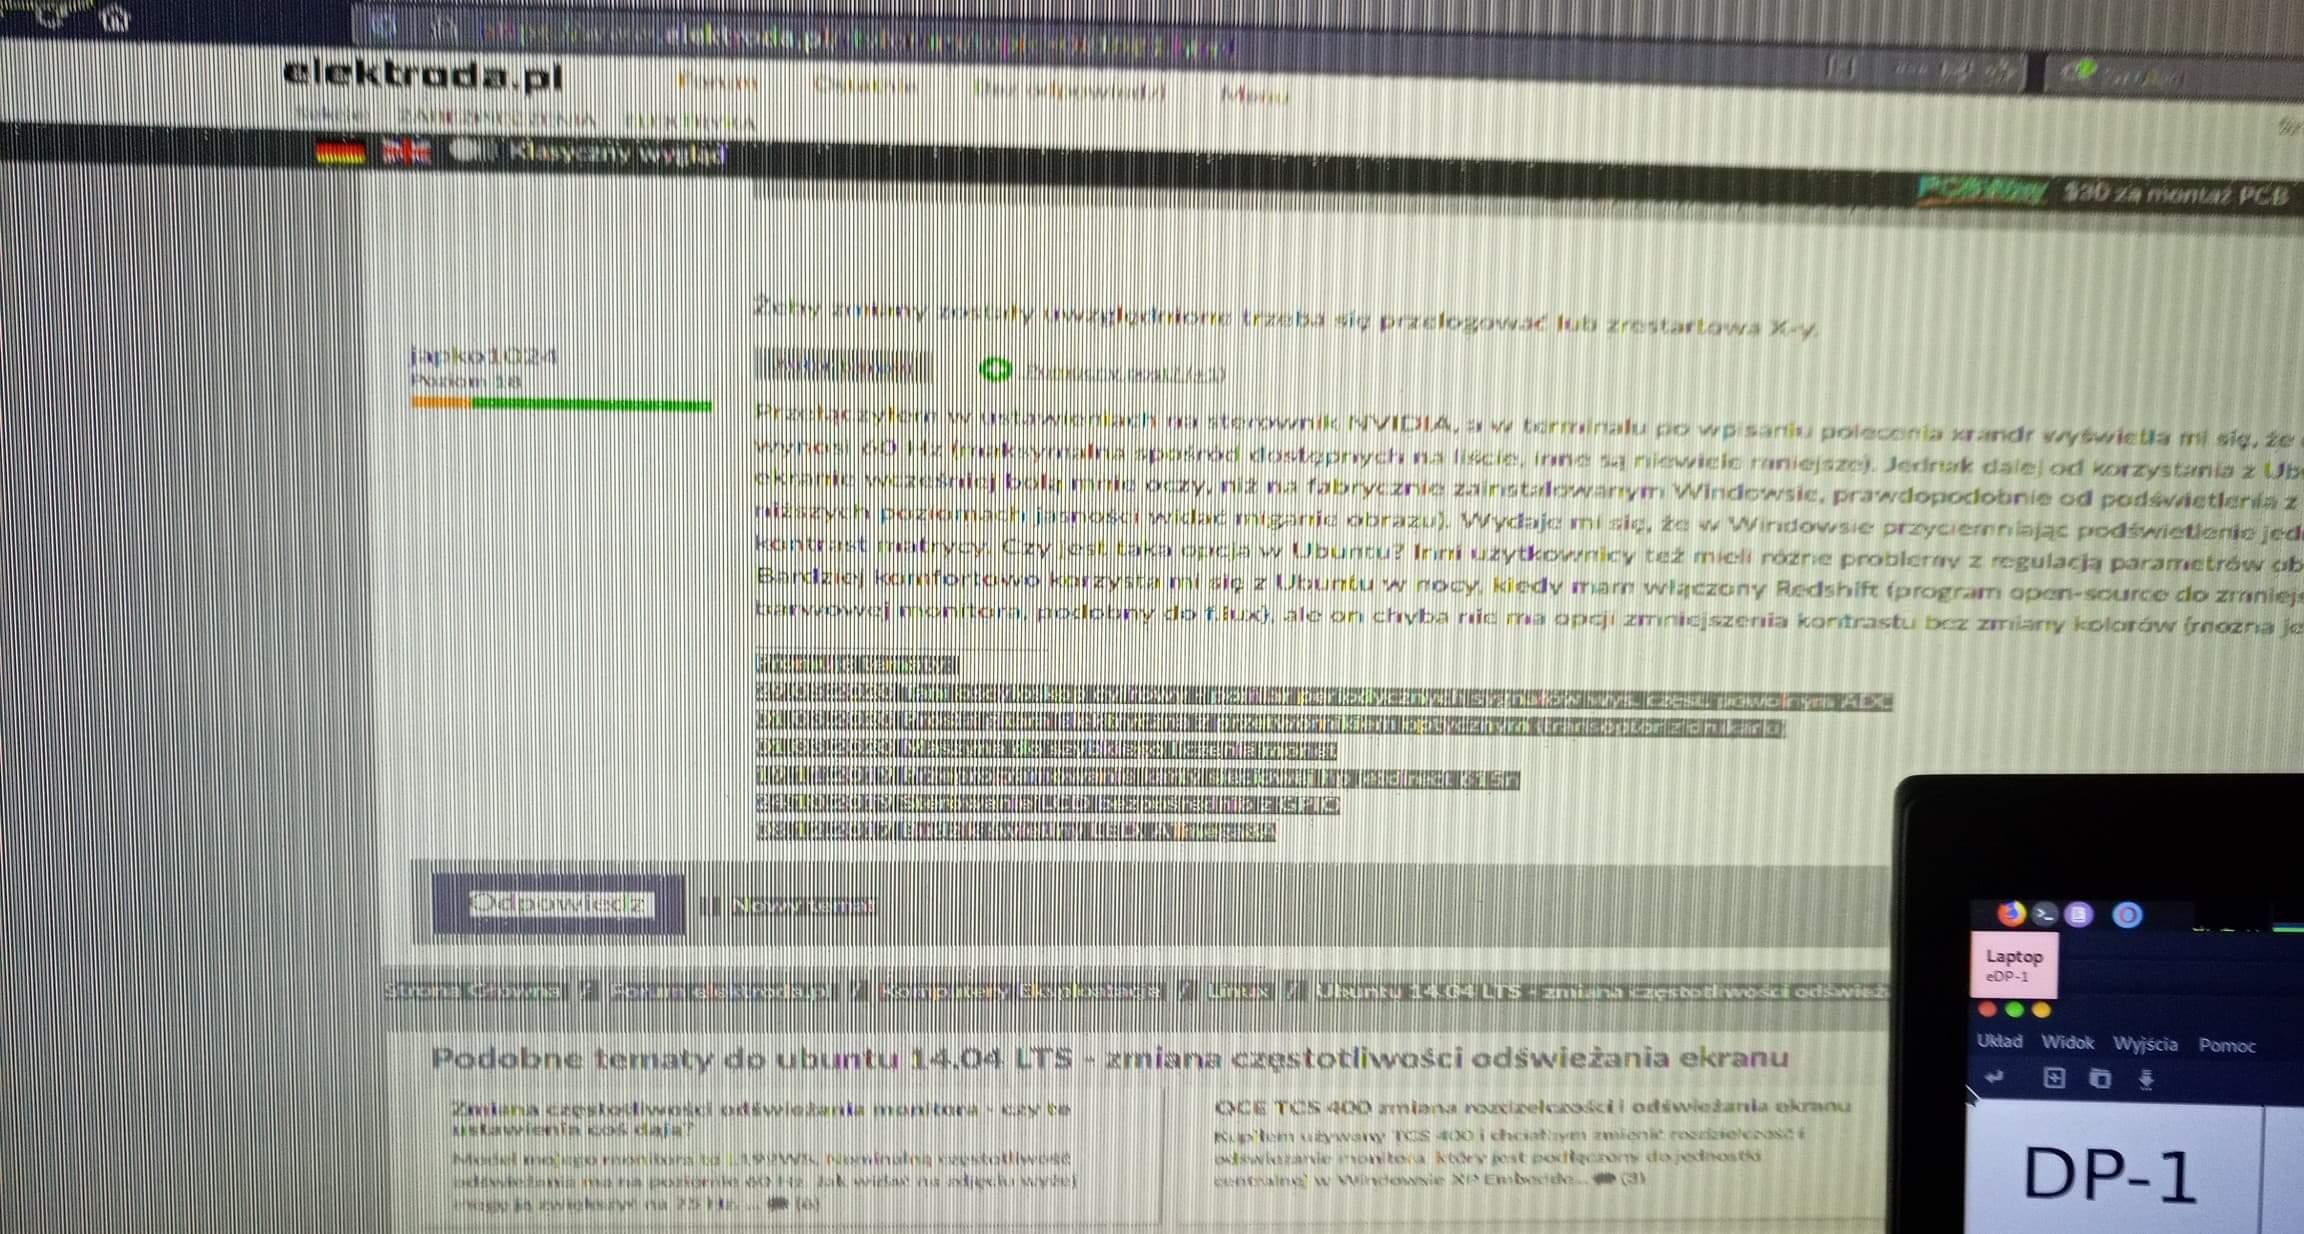 https://i.ibb.co/hH7gp3T/artifacts.jpg